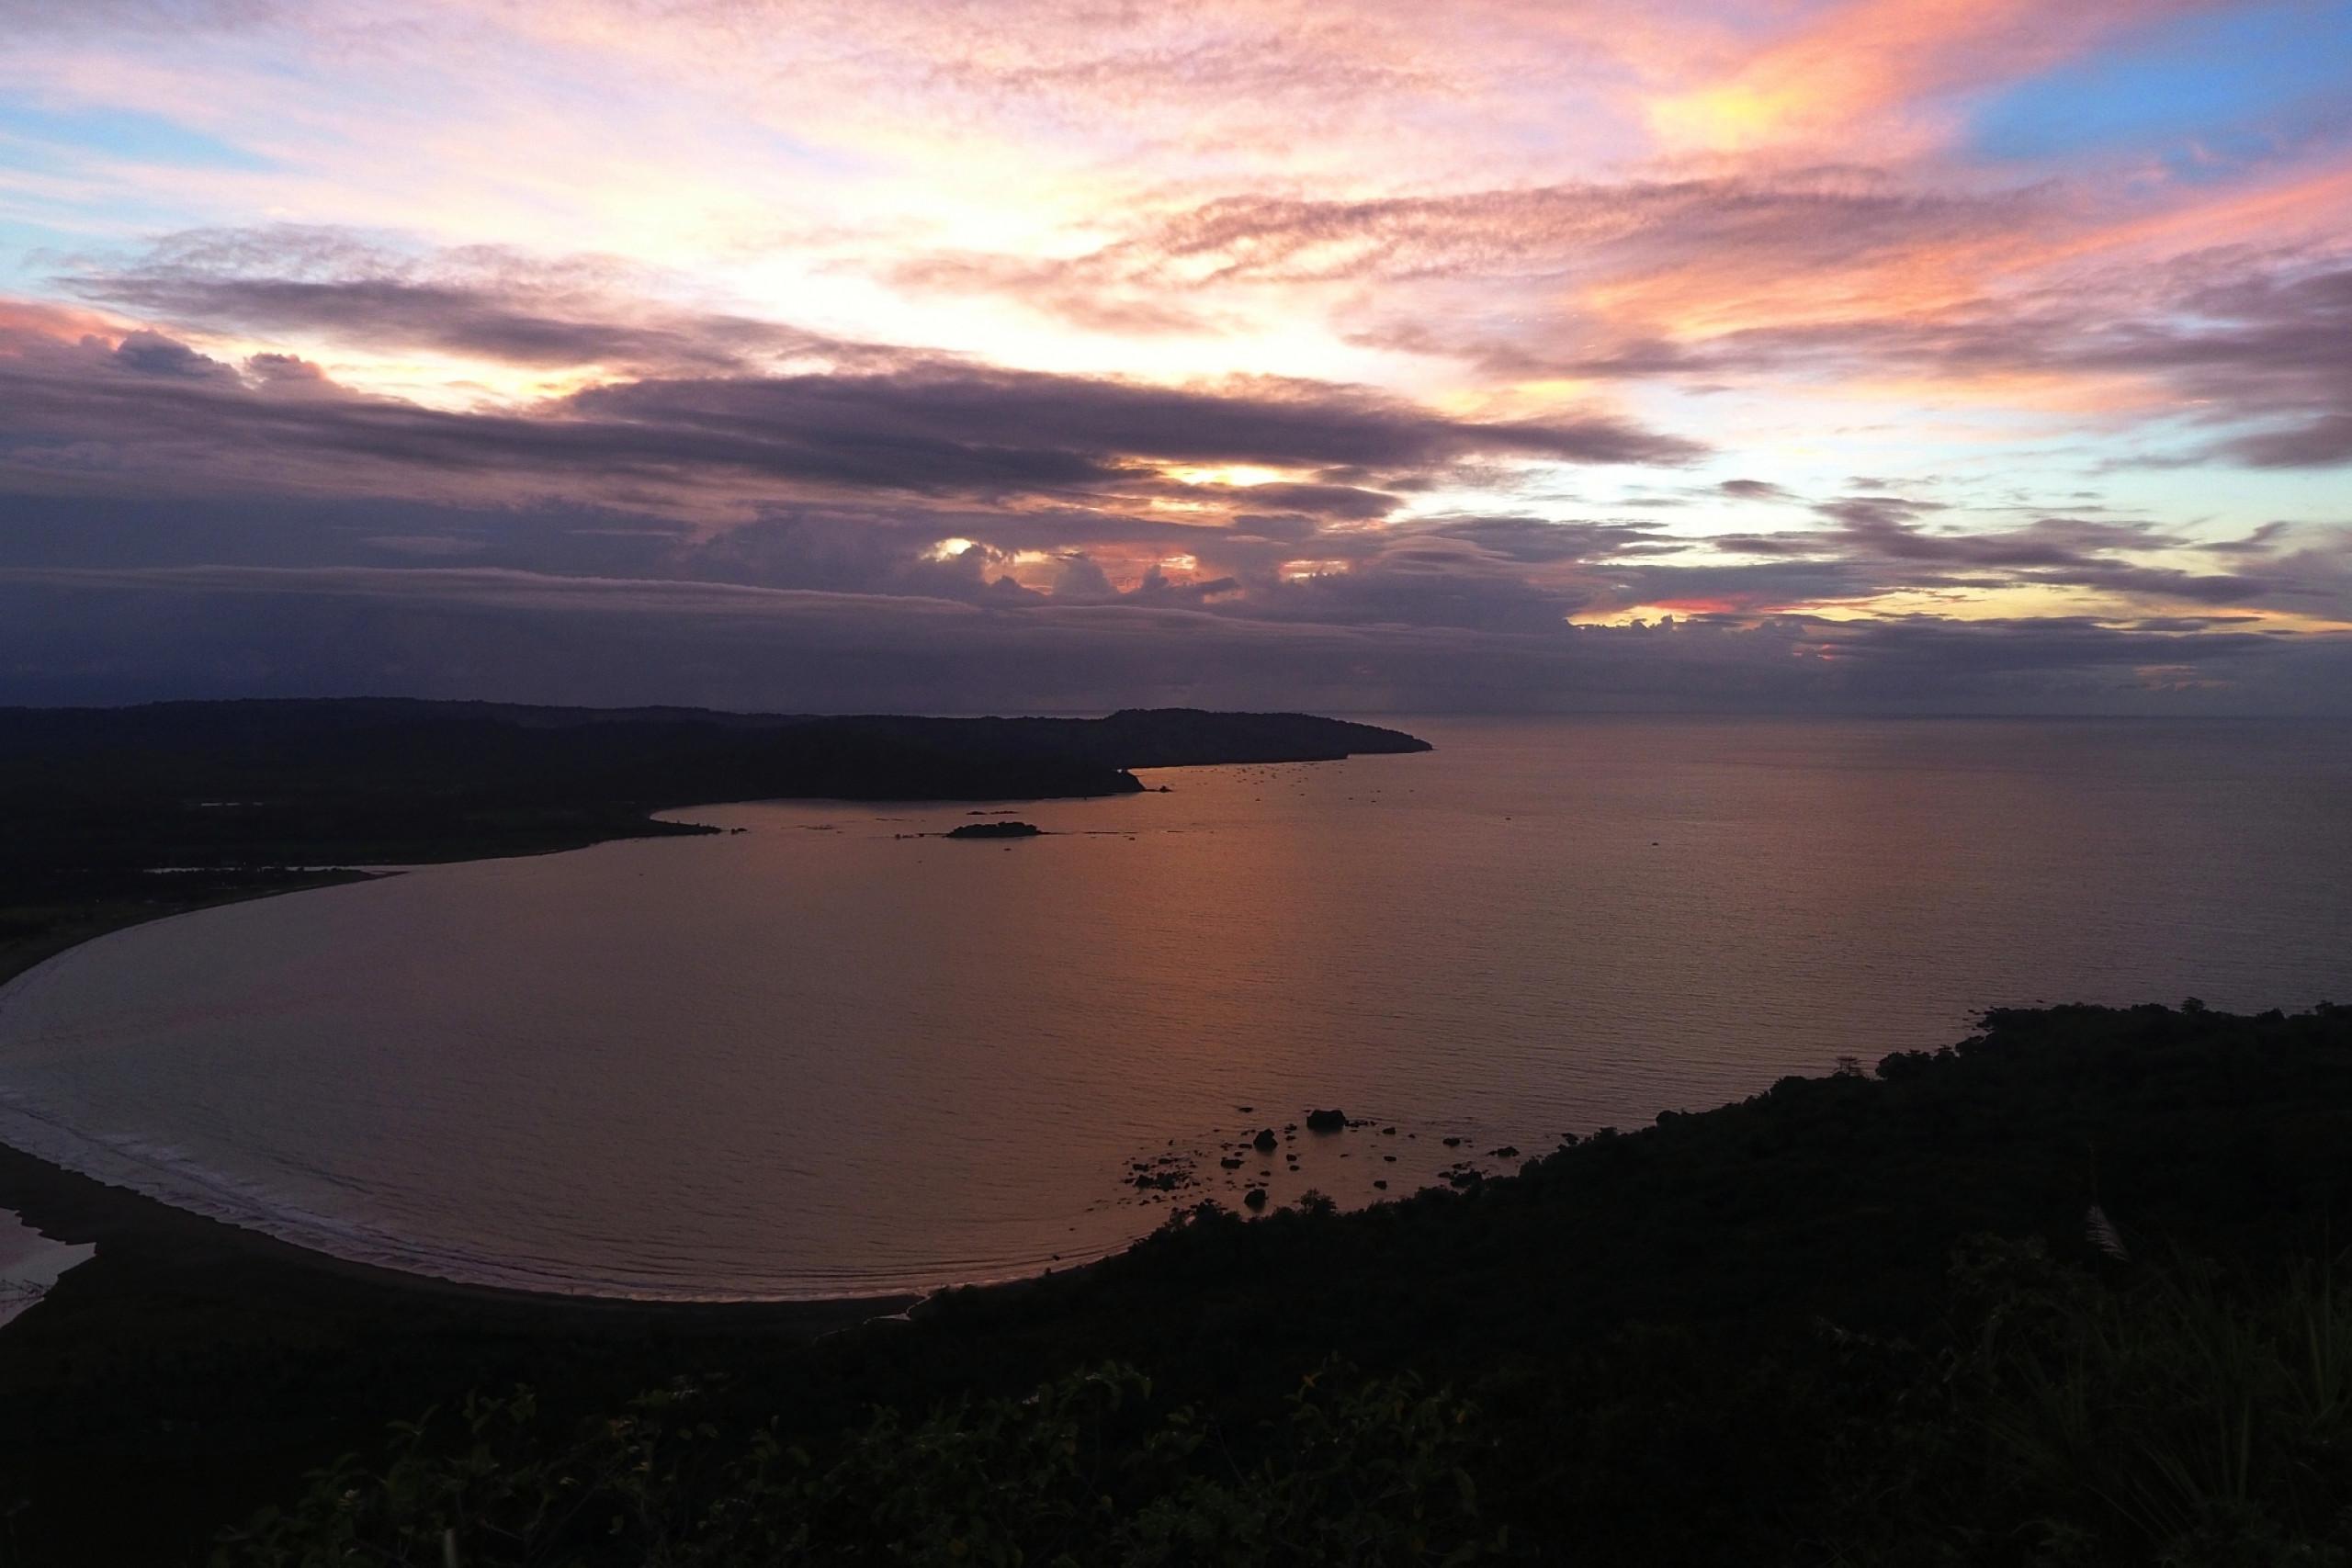 KPBU Jabar - Pengembangan Pariwisata Geopark Ciletuh